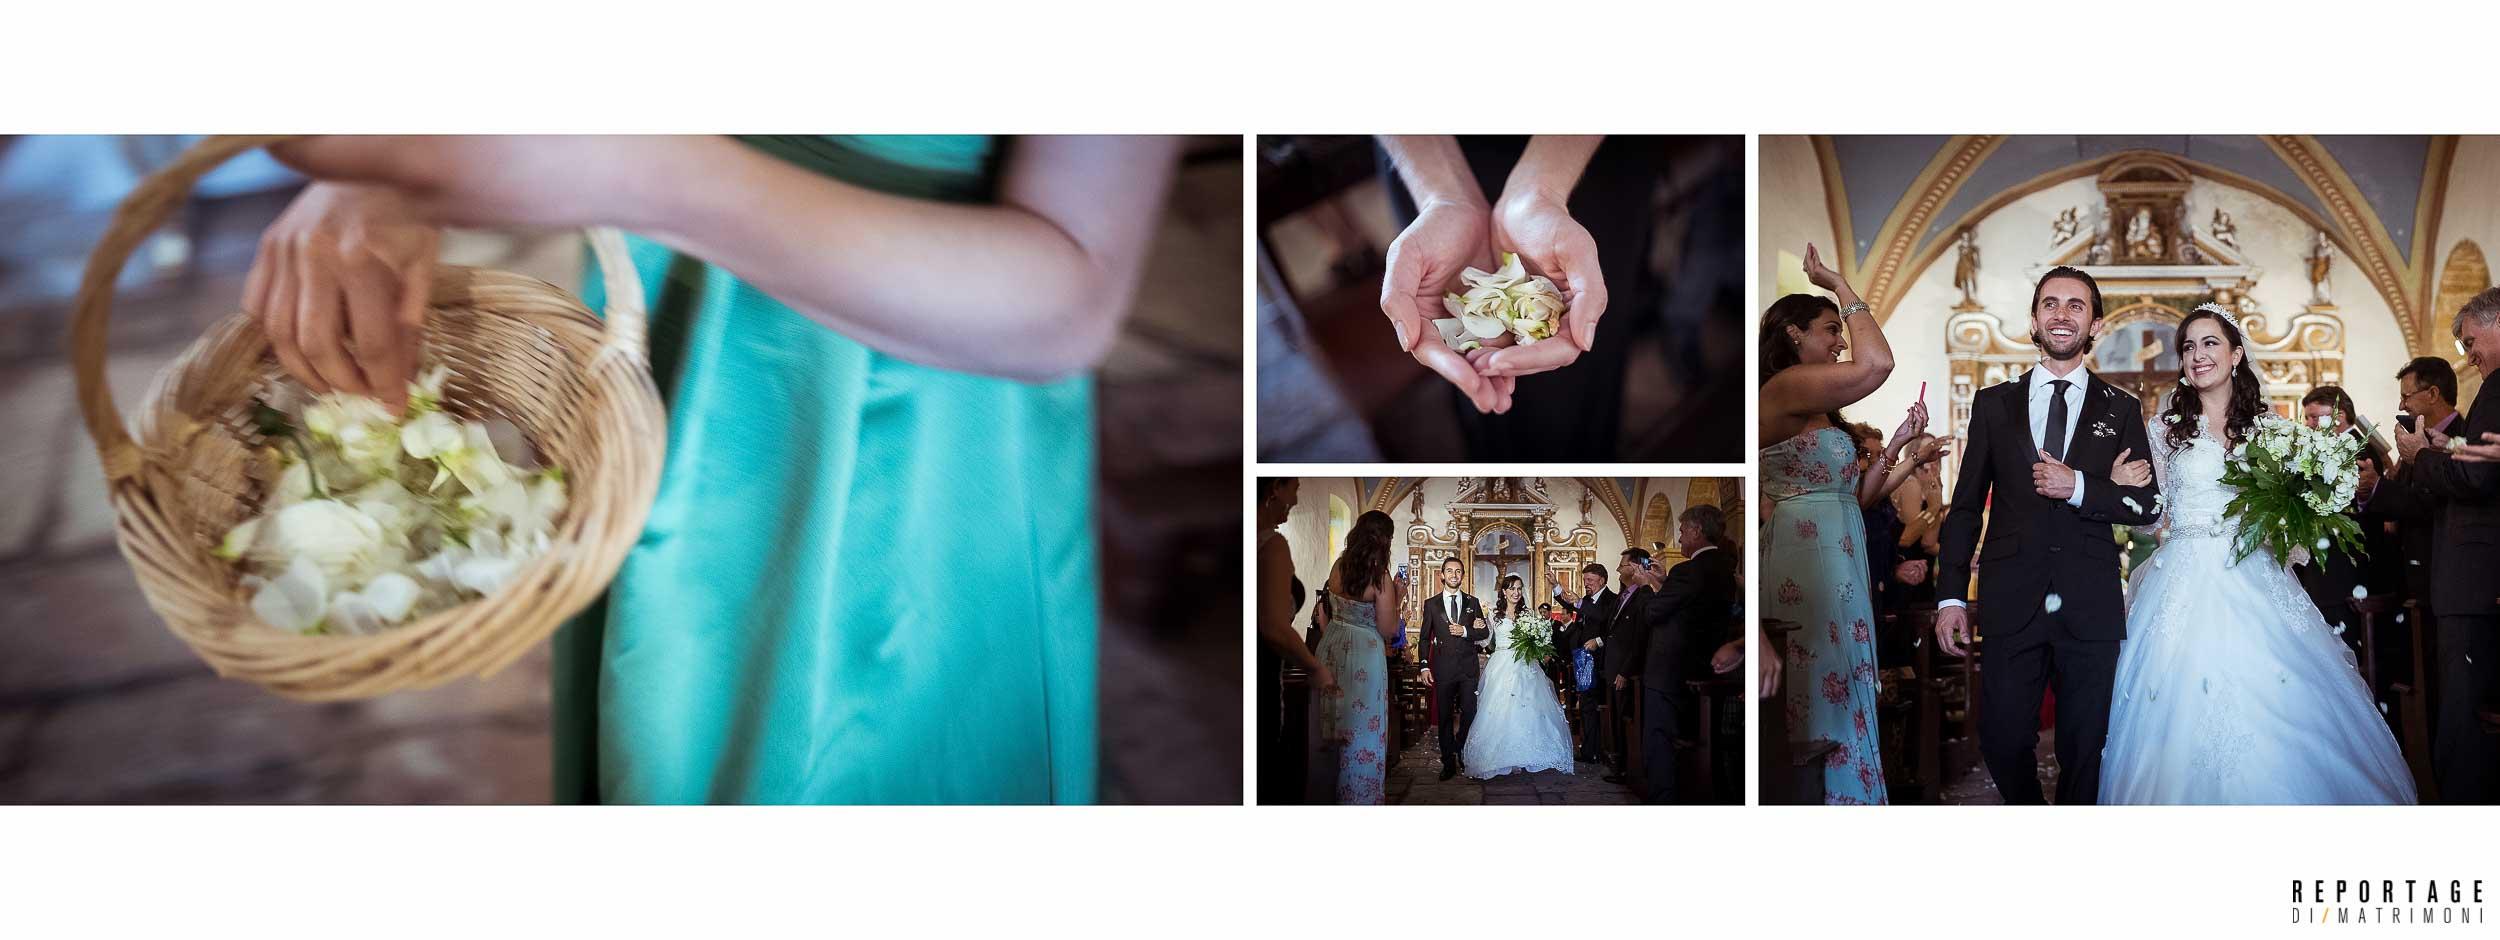 labro_wedding10